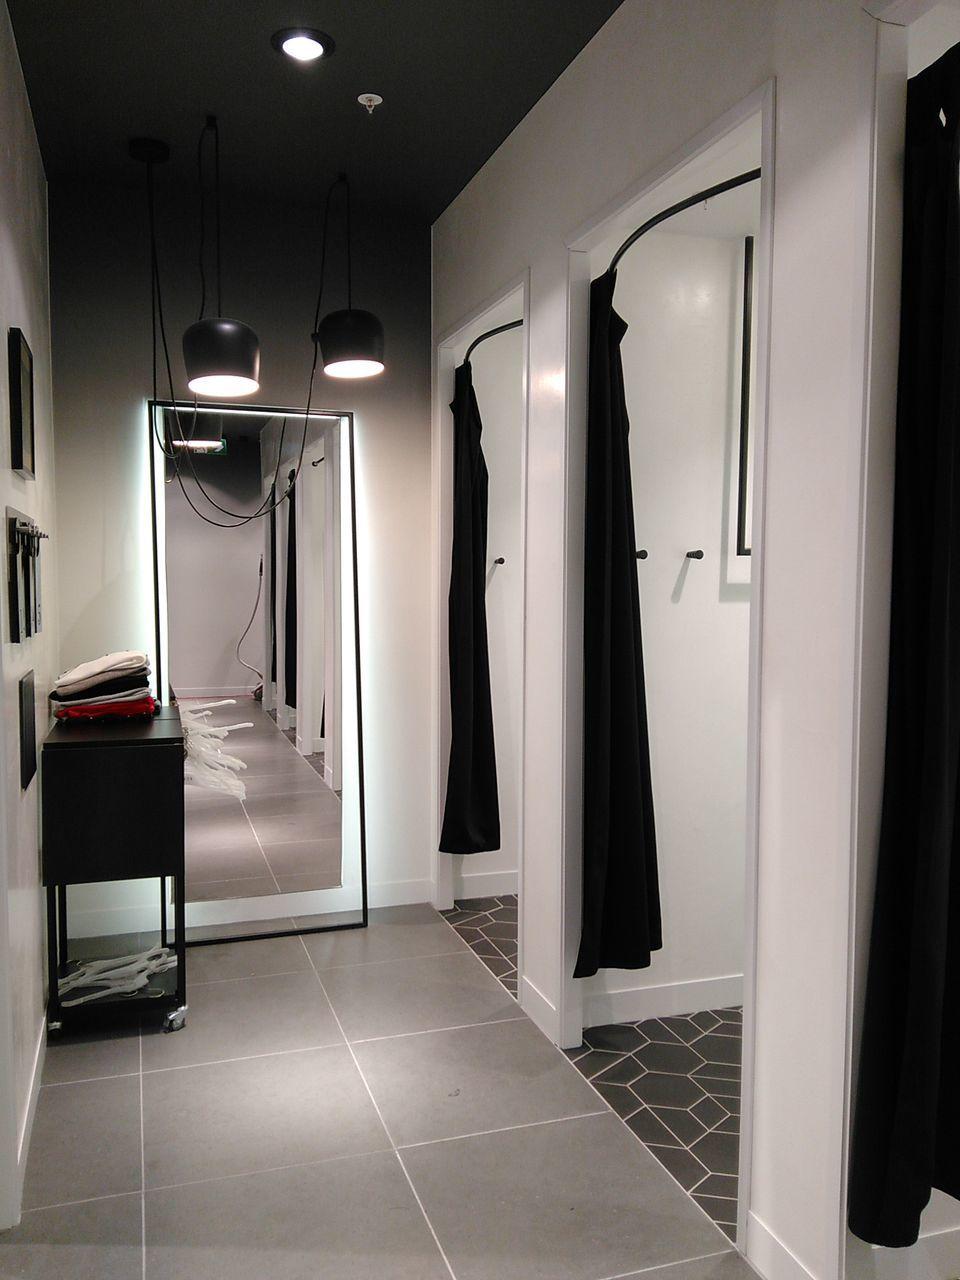 indoors, door, tiled floor, no people, illuminated, home showcase interior, open door, cabinet, architecture, day, laundromat